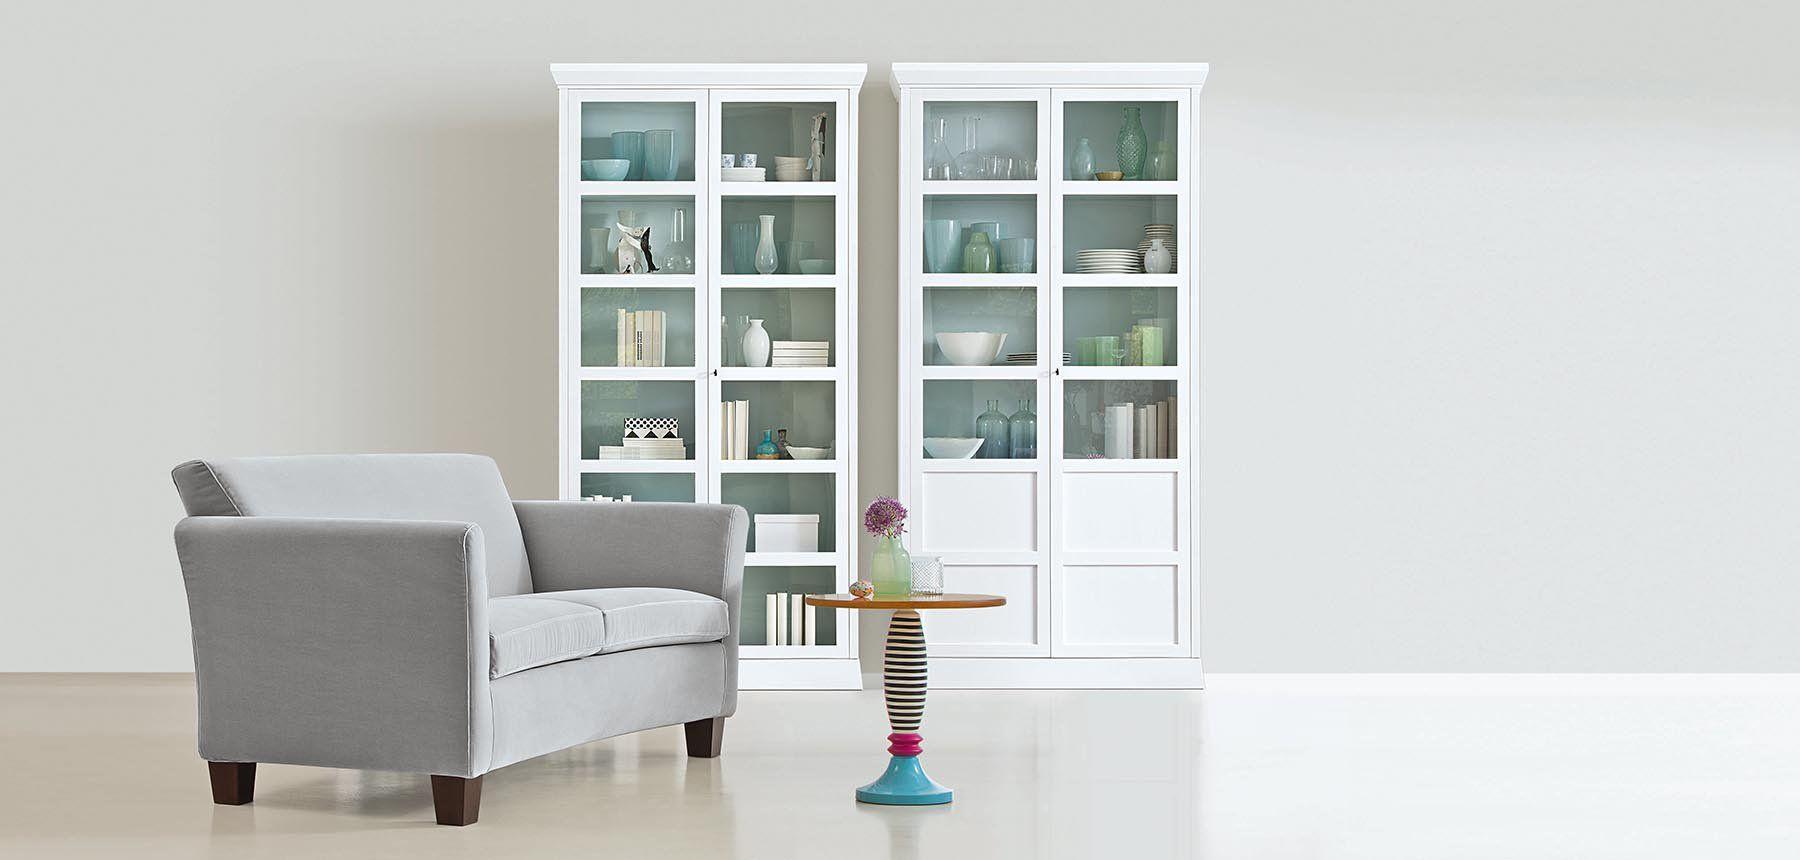 Schranke Home Furniture Home Decor